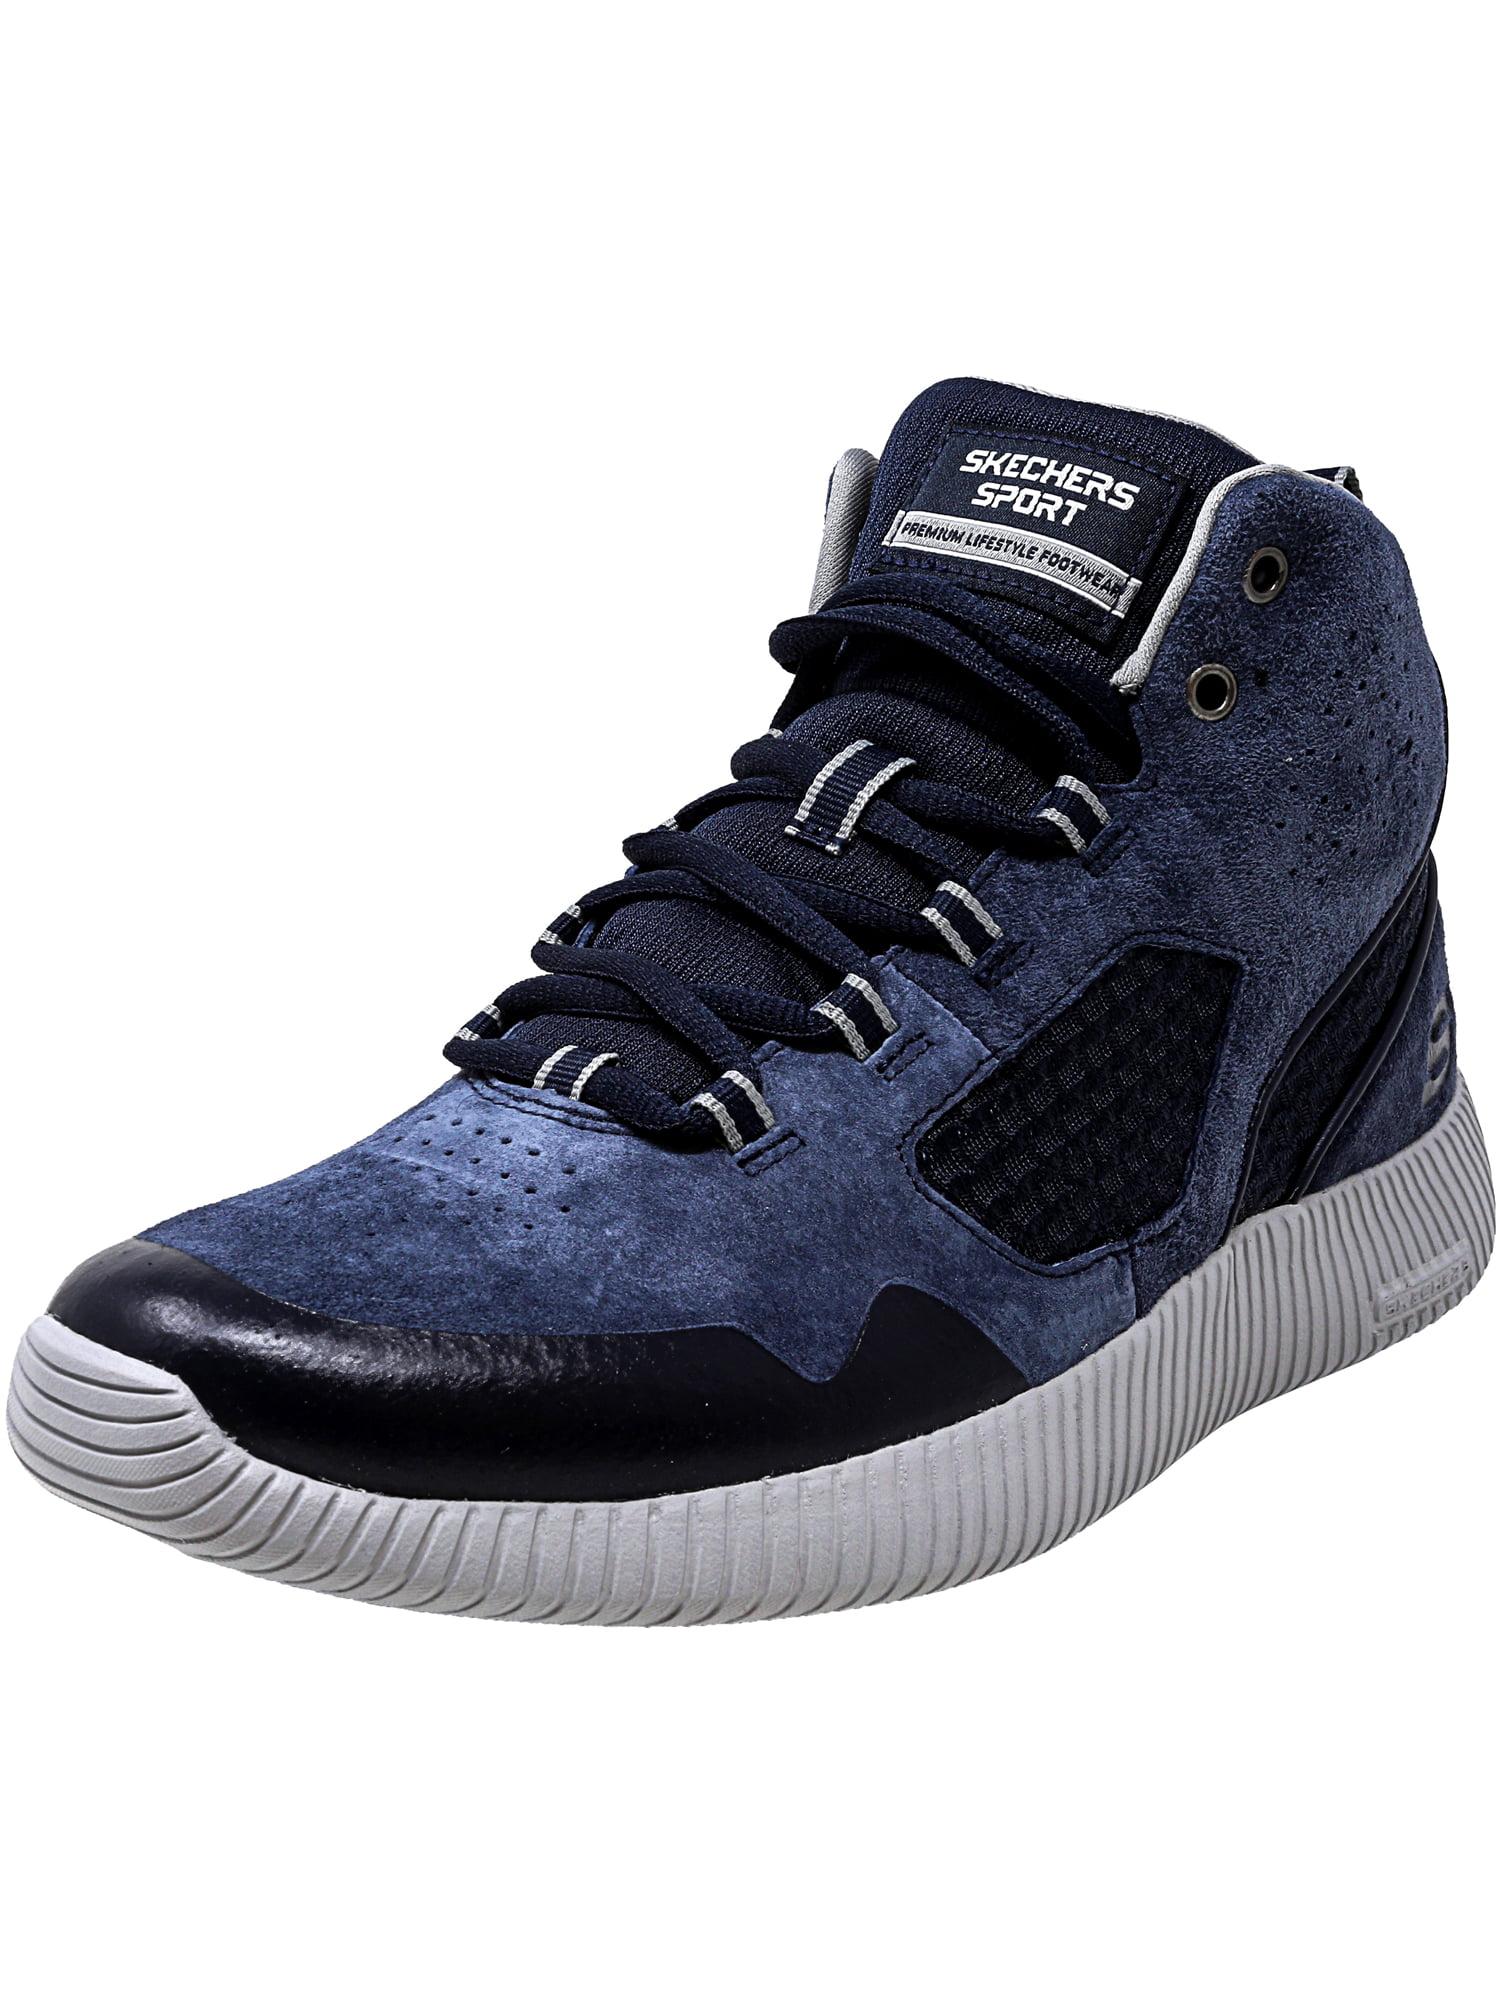 Skechers Men's Depth Charge - Drango High-Top Fashion Sneaker